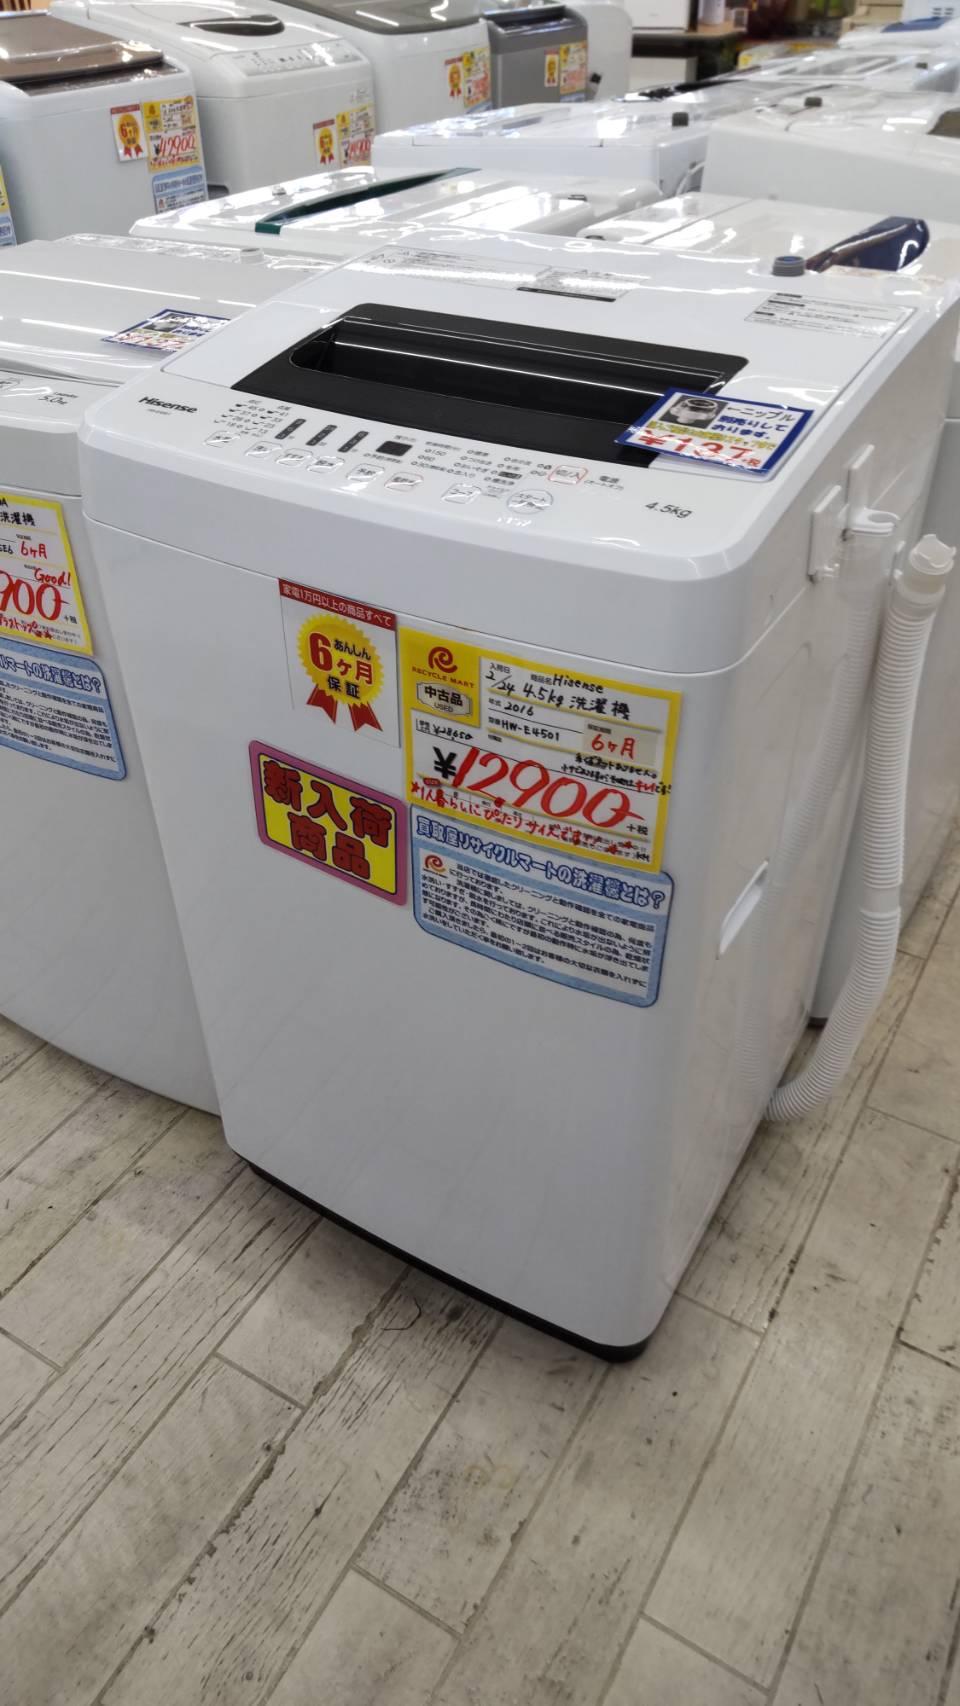 【Hisense ハイセンス 4.5kg 洗濯機 2016年 HW-E4501 一人暮らしにピッタリのサイズ】を買取させて頂きました!の買取-